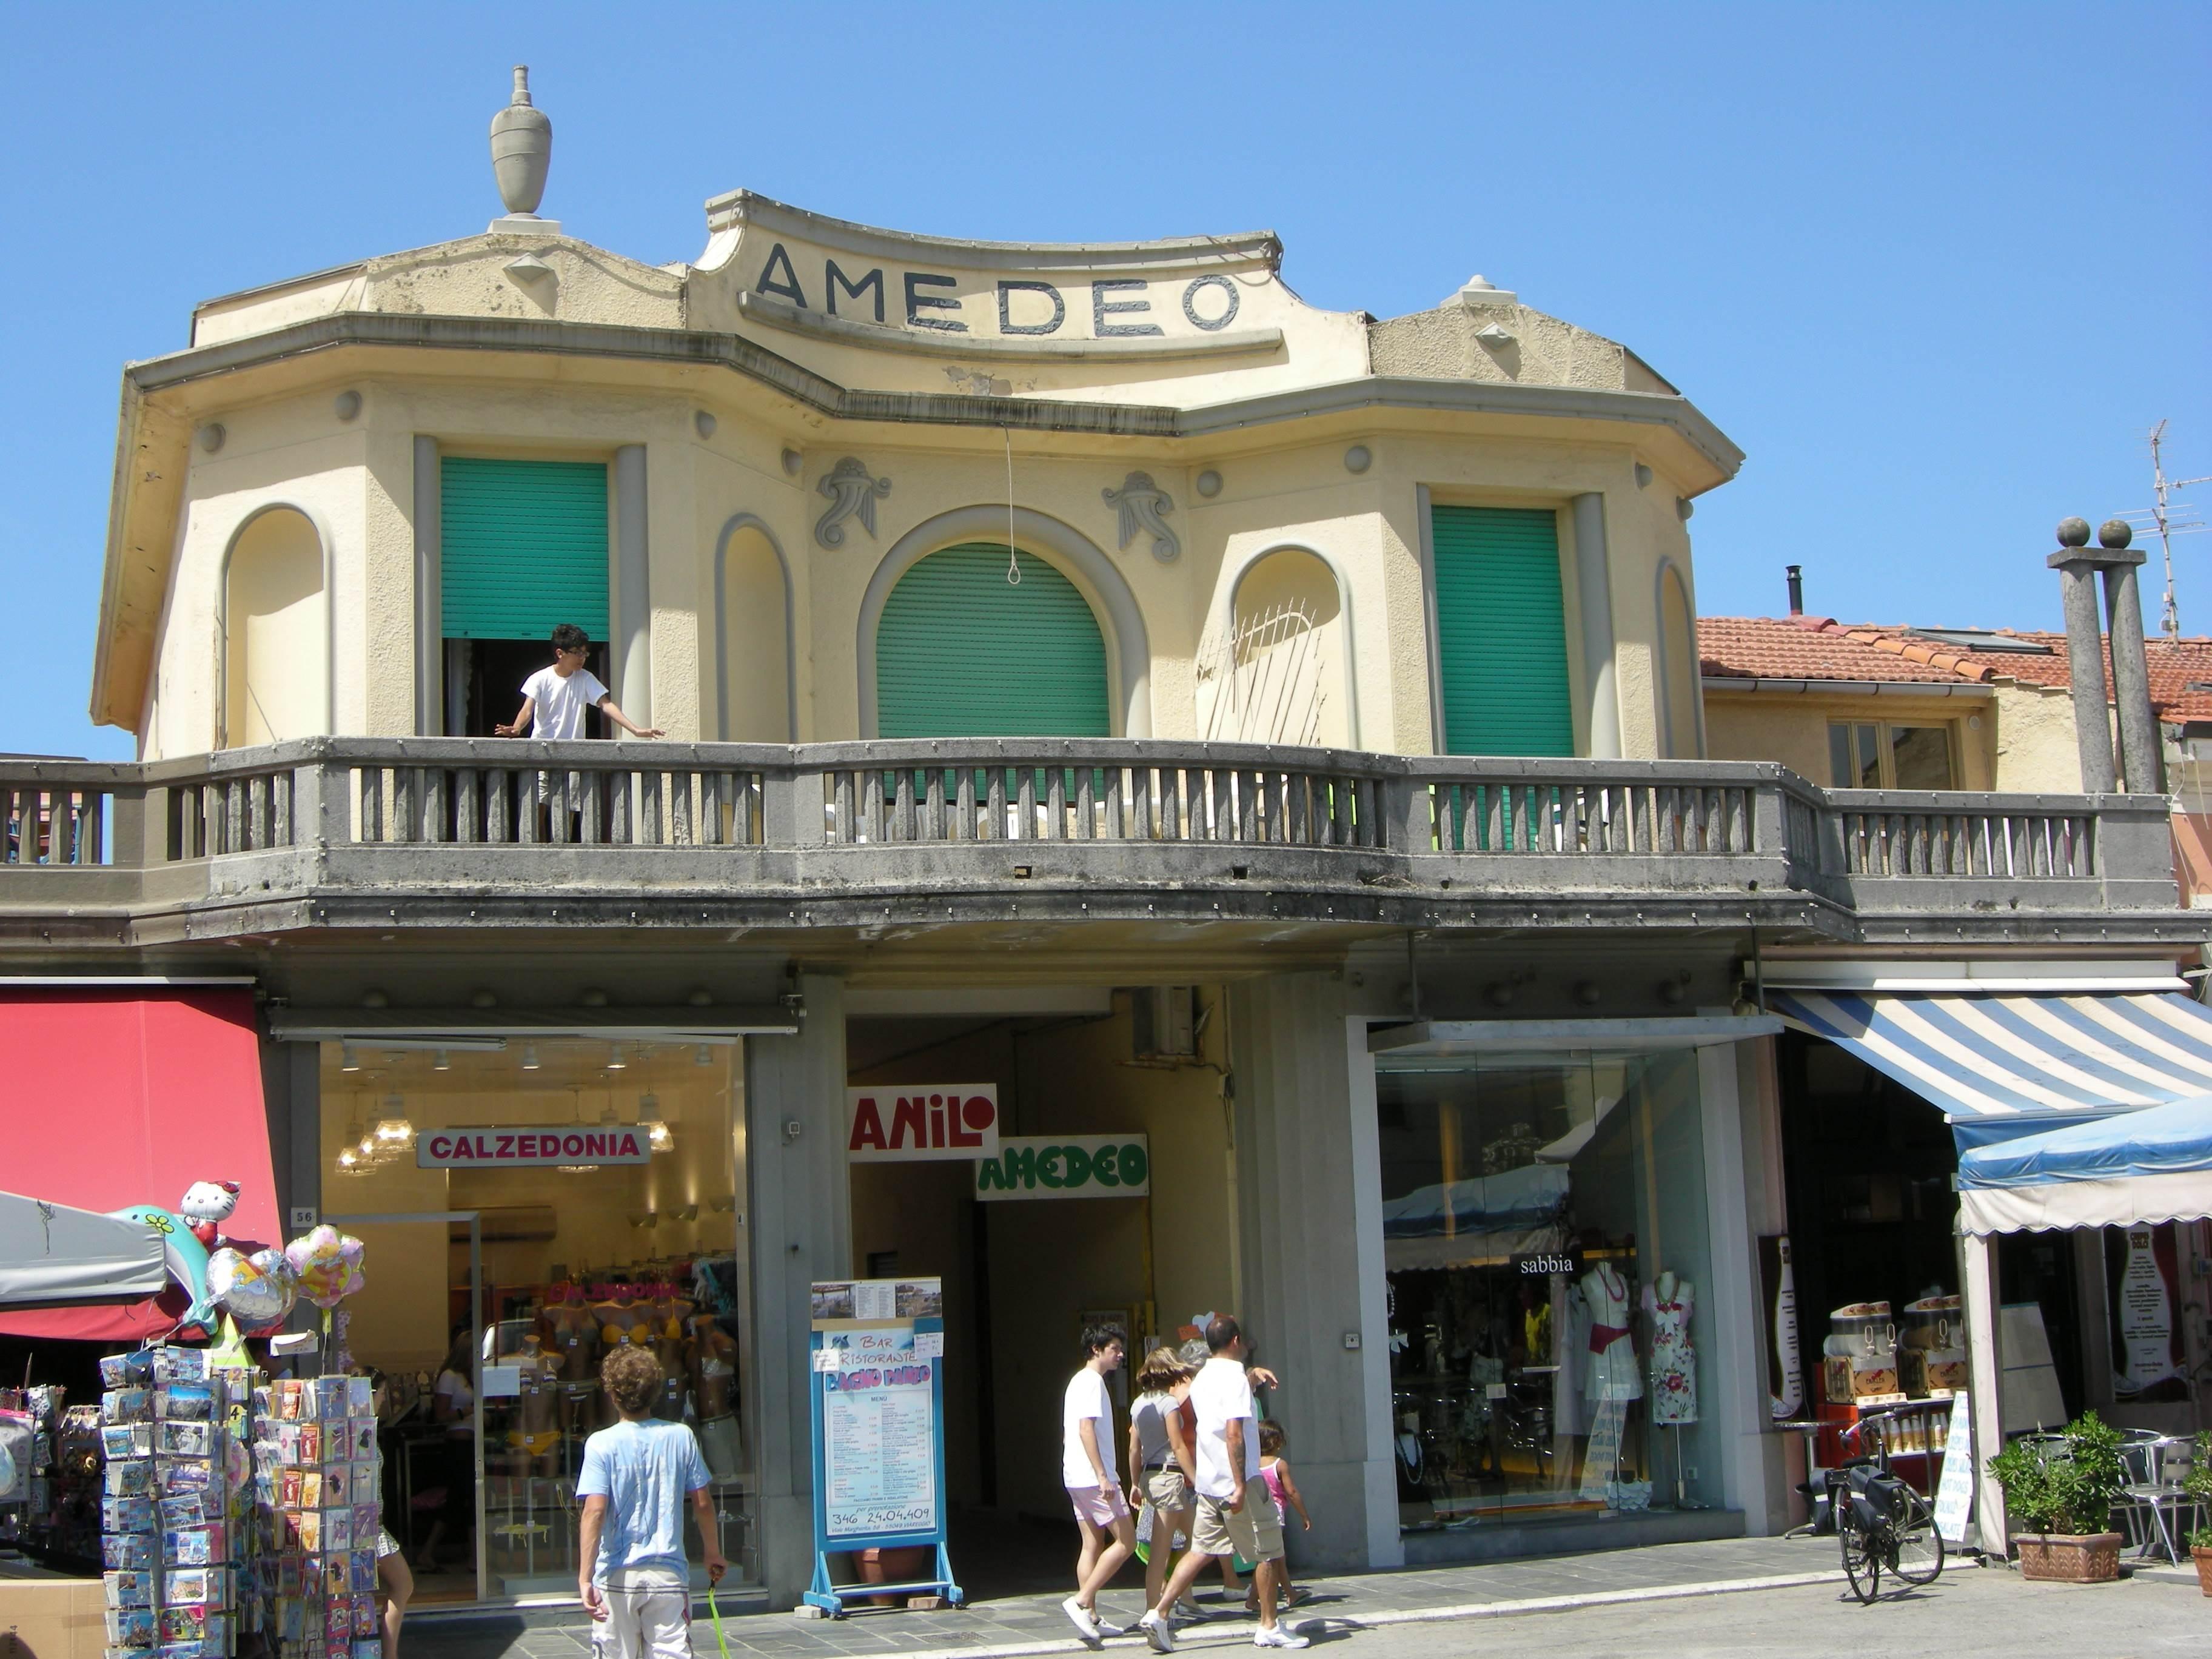 Online hafenhandbuch italien marina viareggio ligurisches meer - Bagno amedea viareggio ...